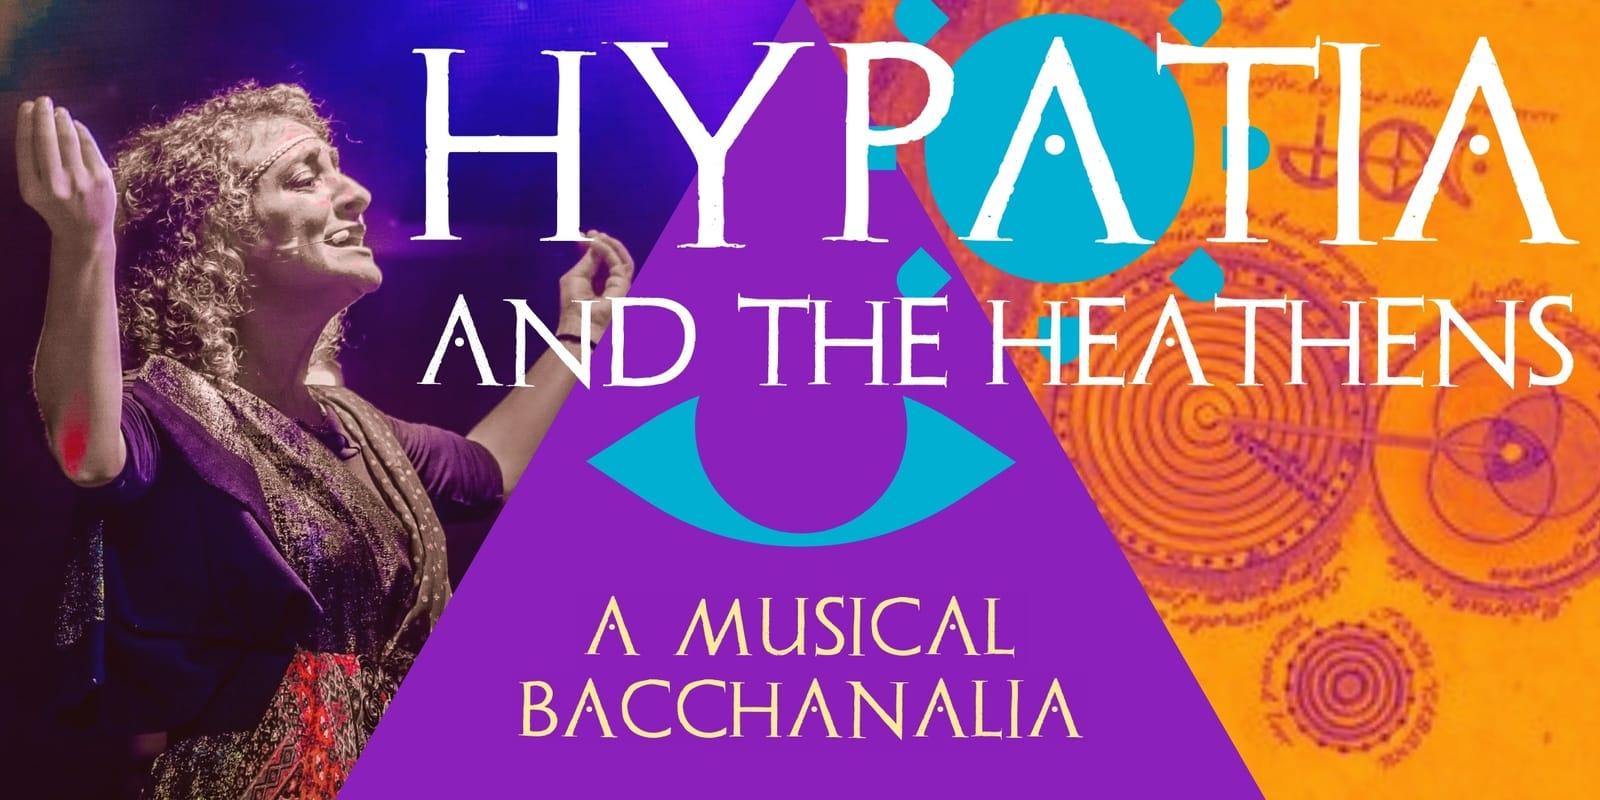 Hypatia and the Heathens